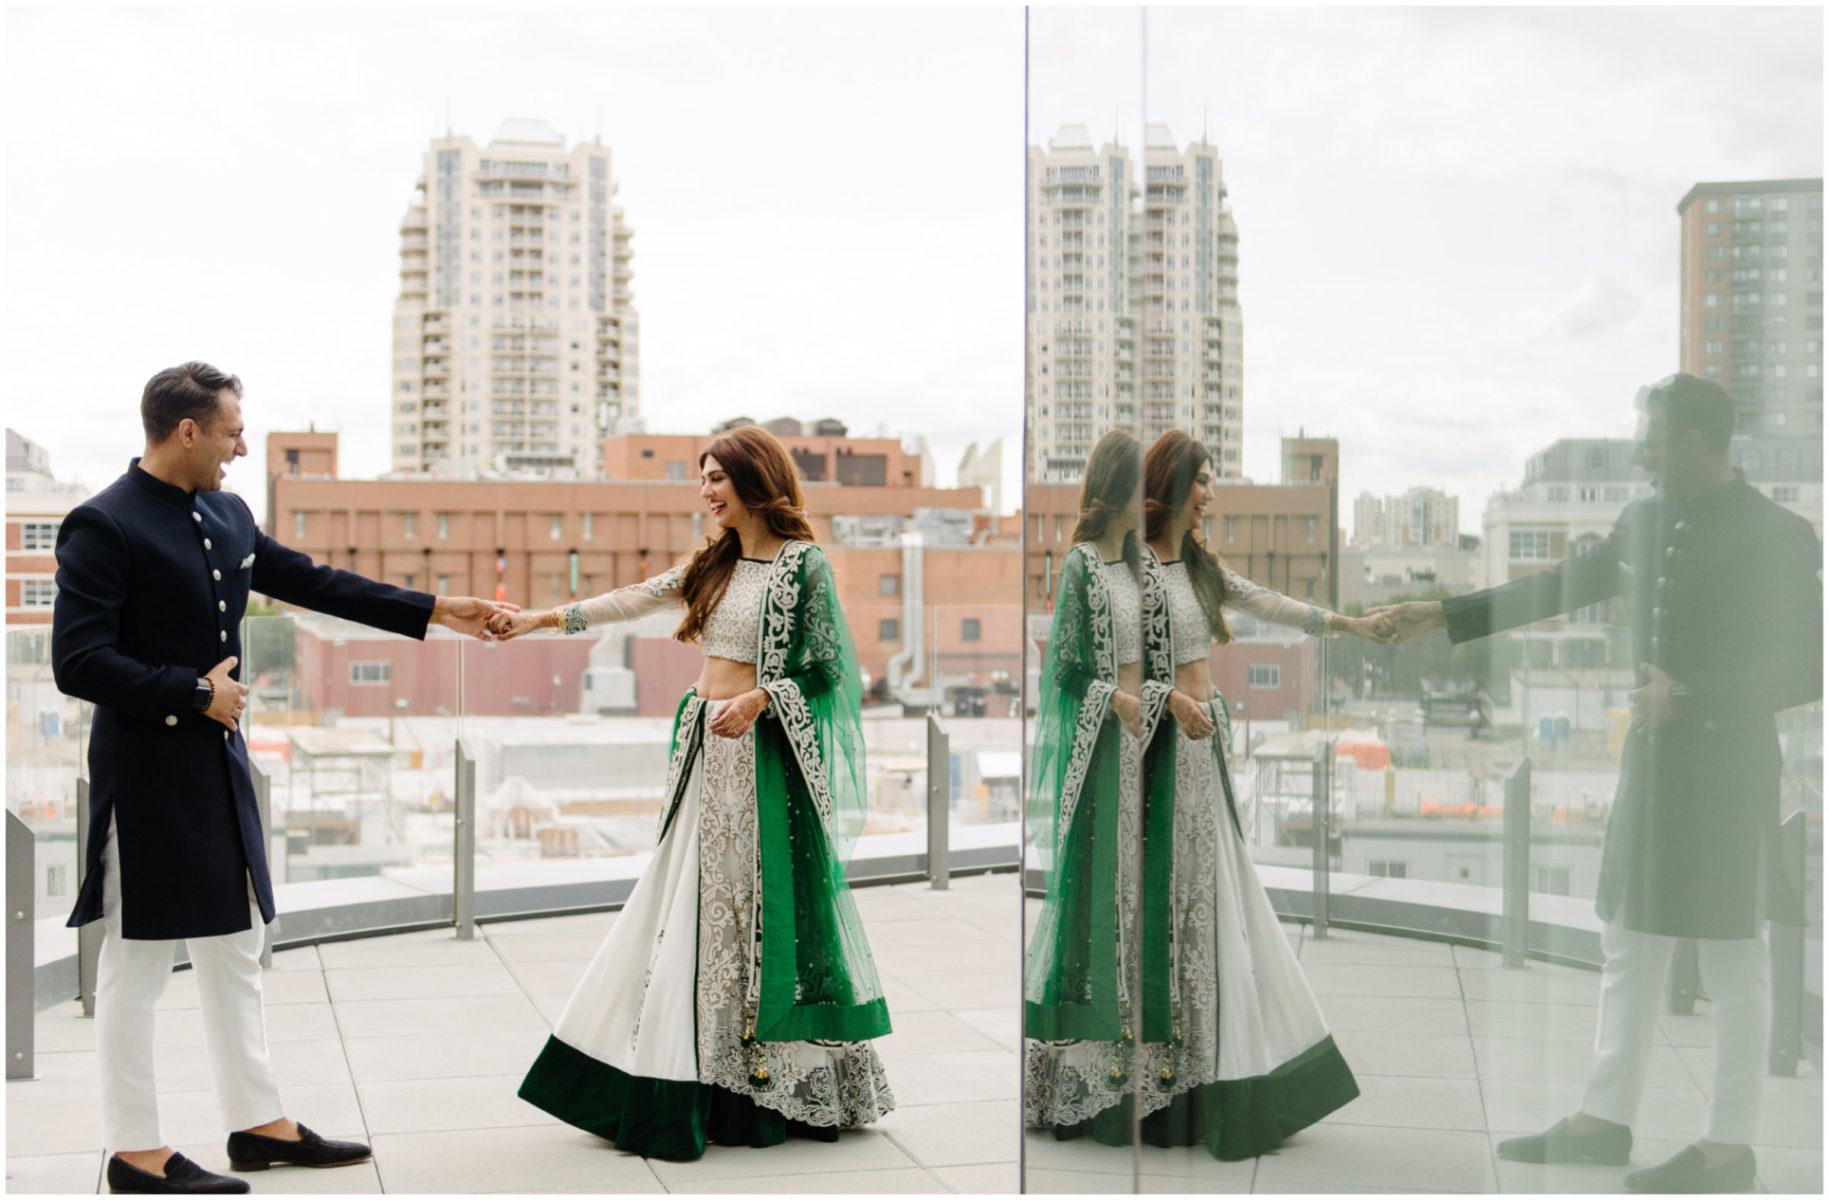 JW Marriott Edmonton Wedding Planning and Design